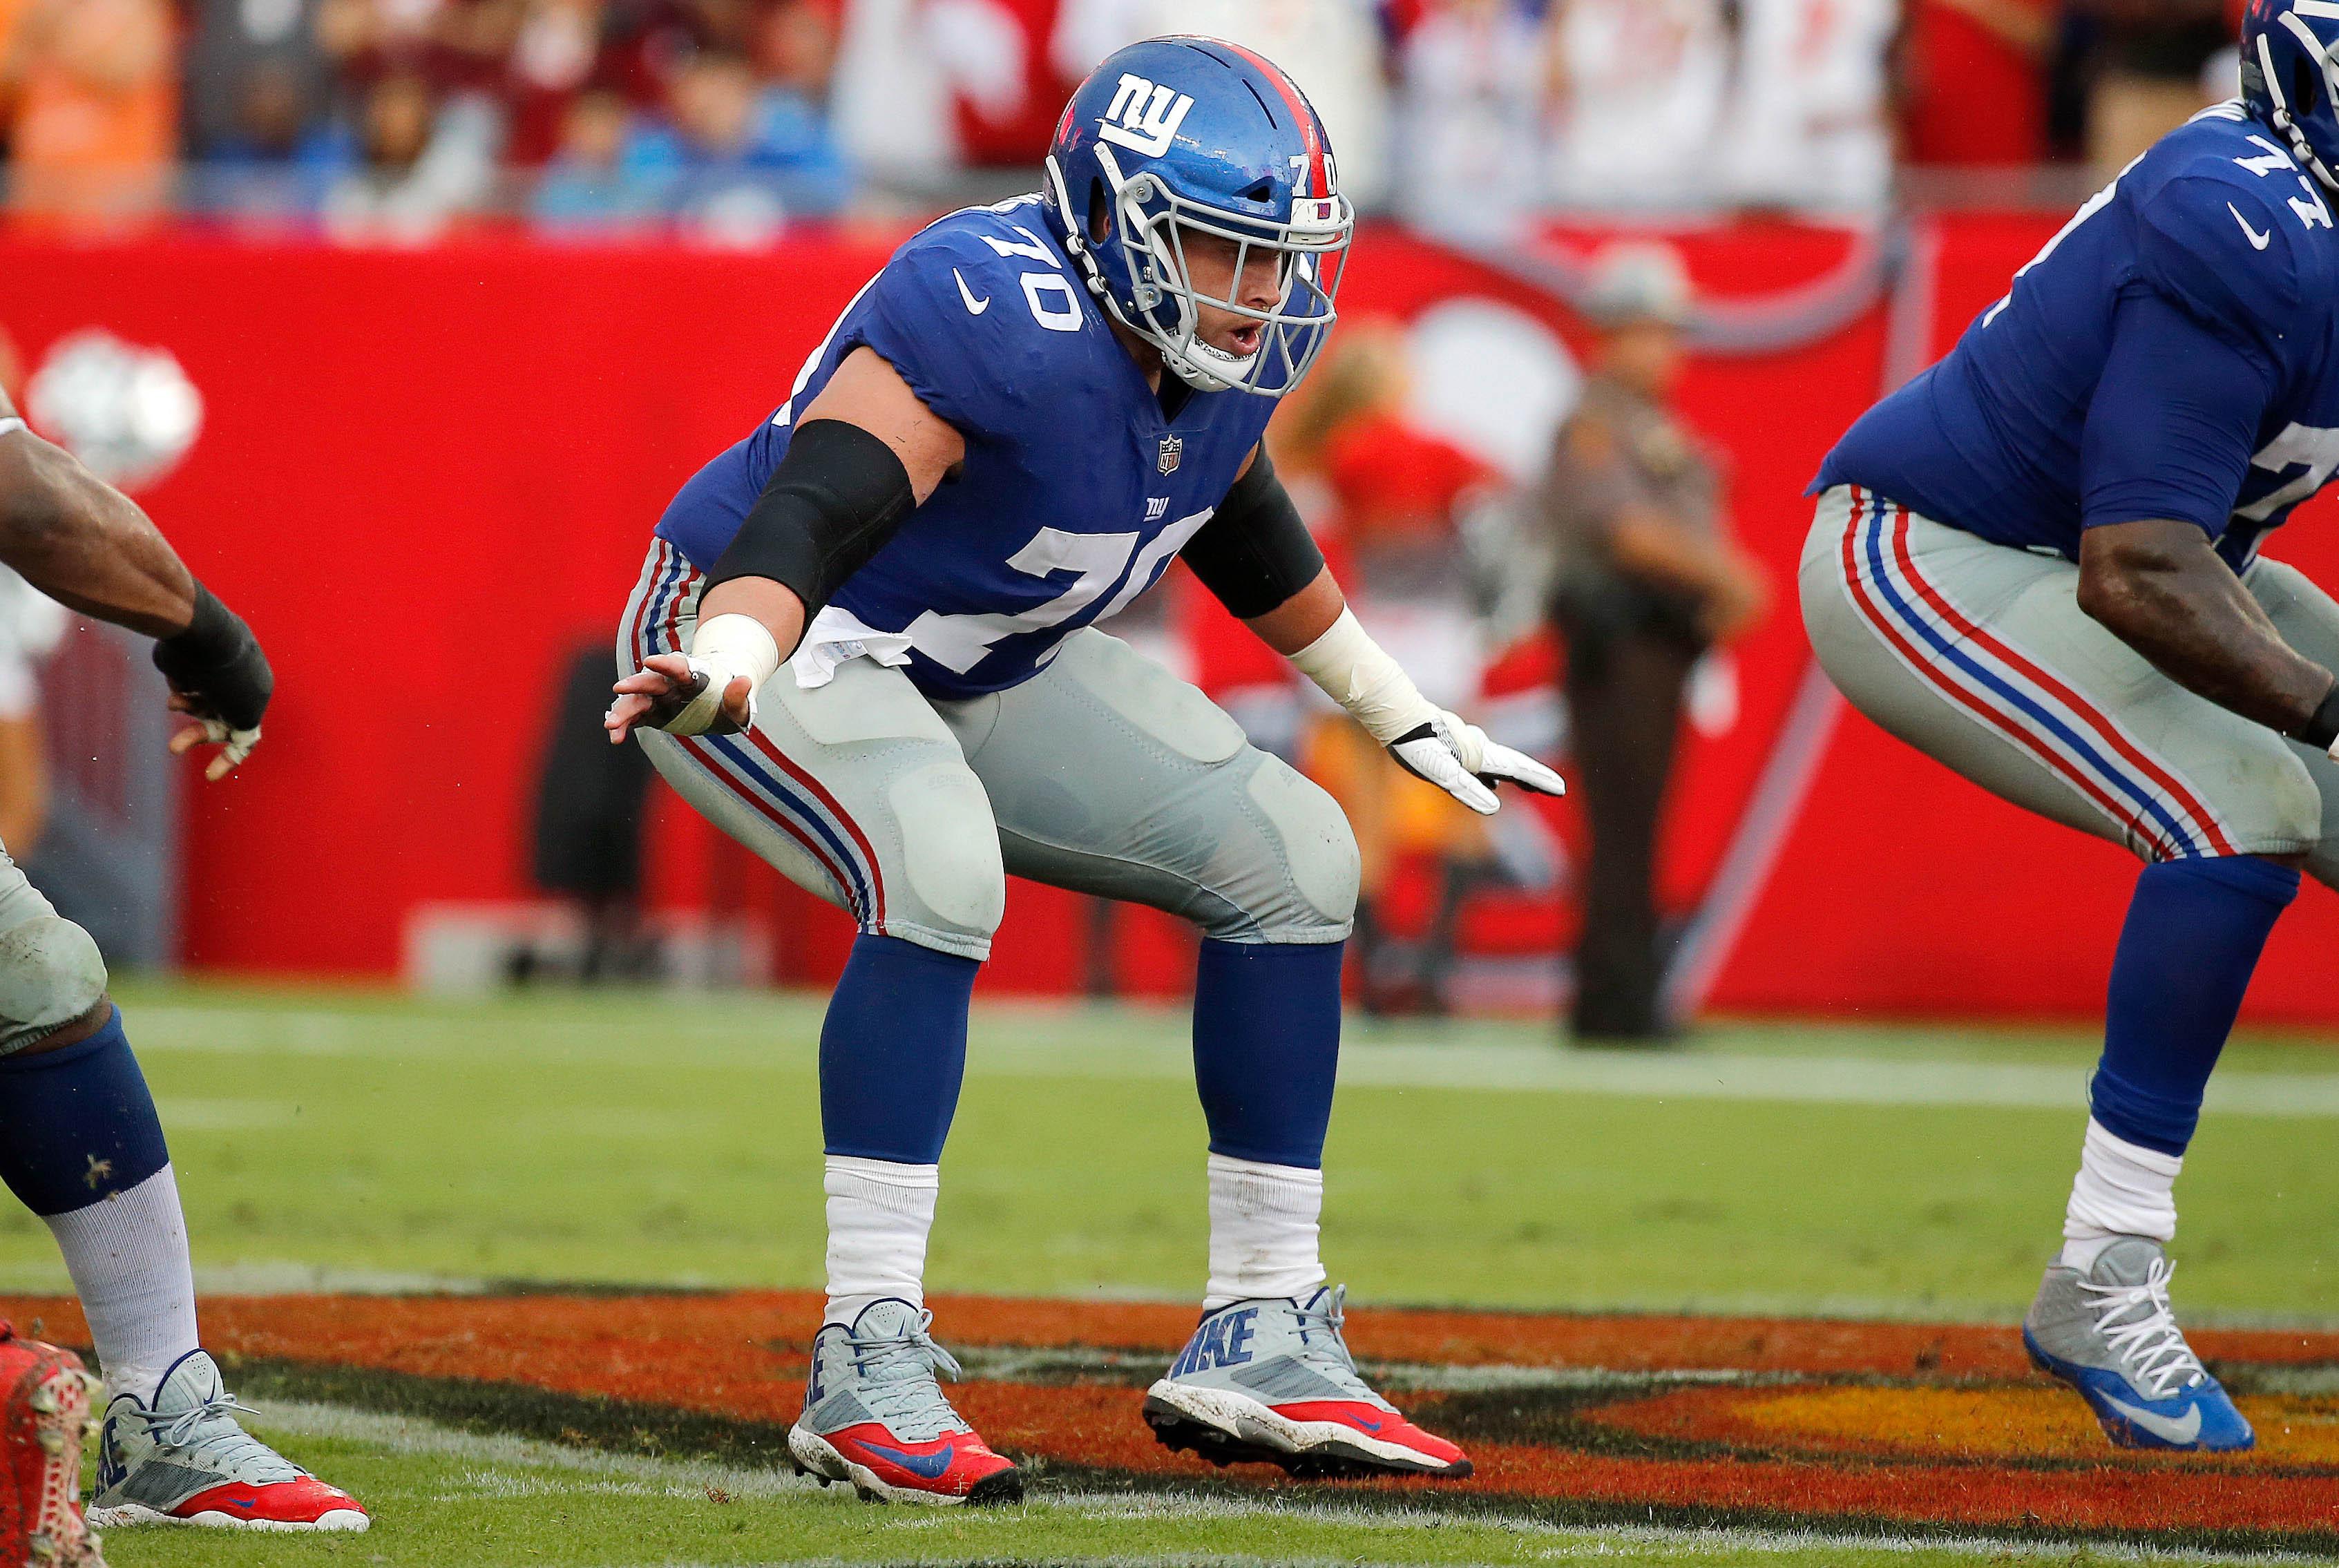 NFL: New York Giants at Tampa Bay Buccaneers